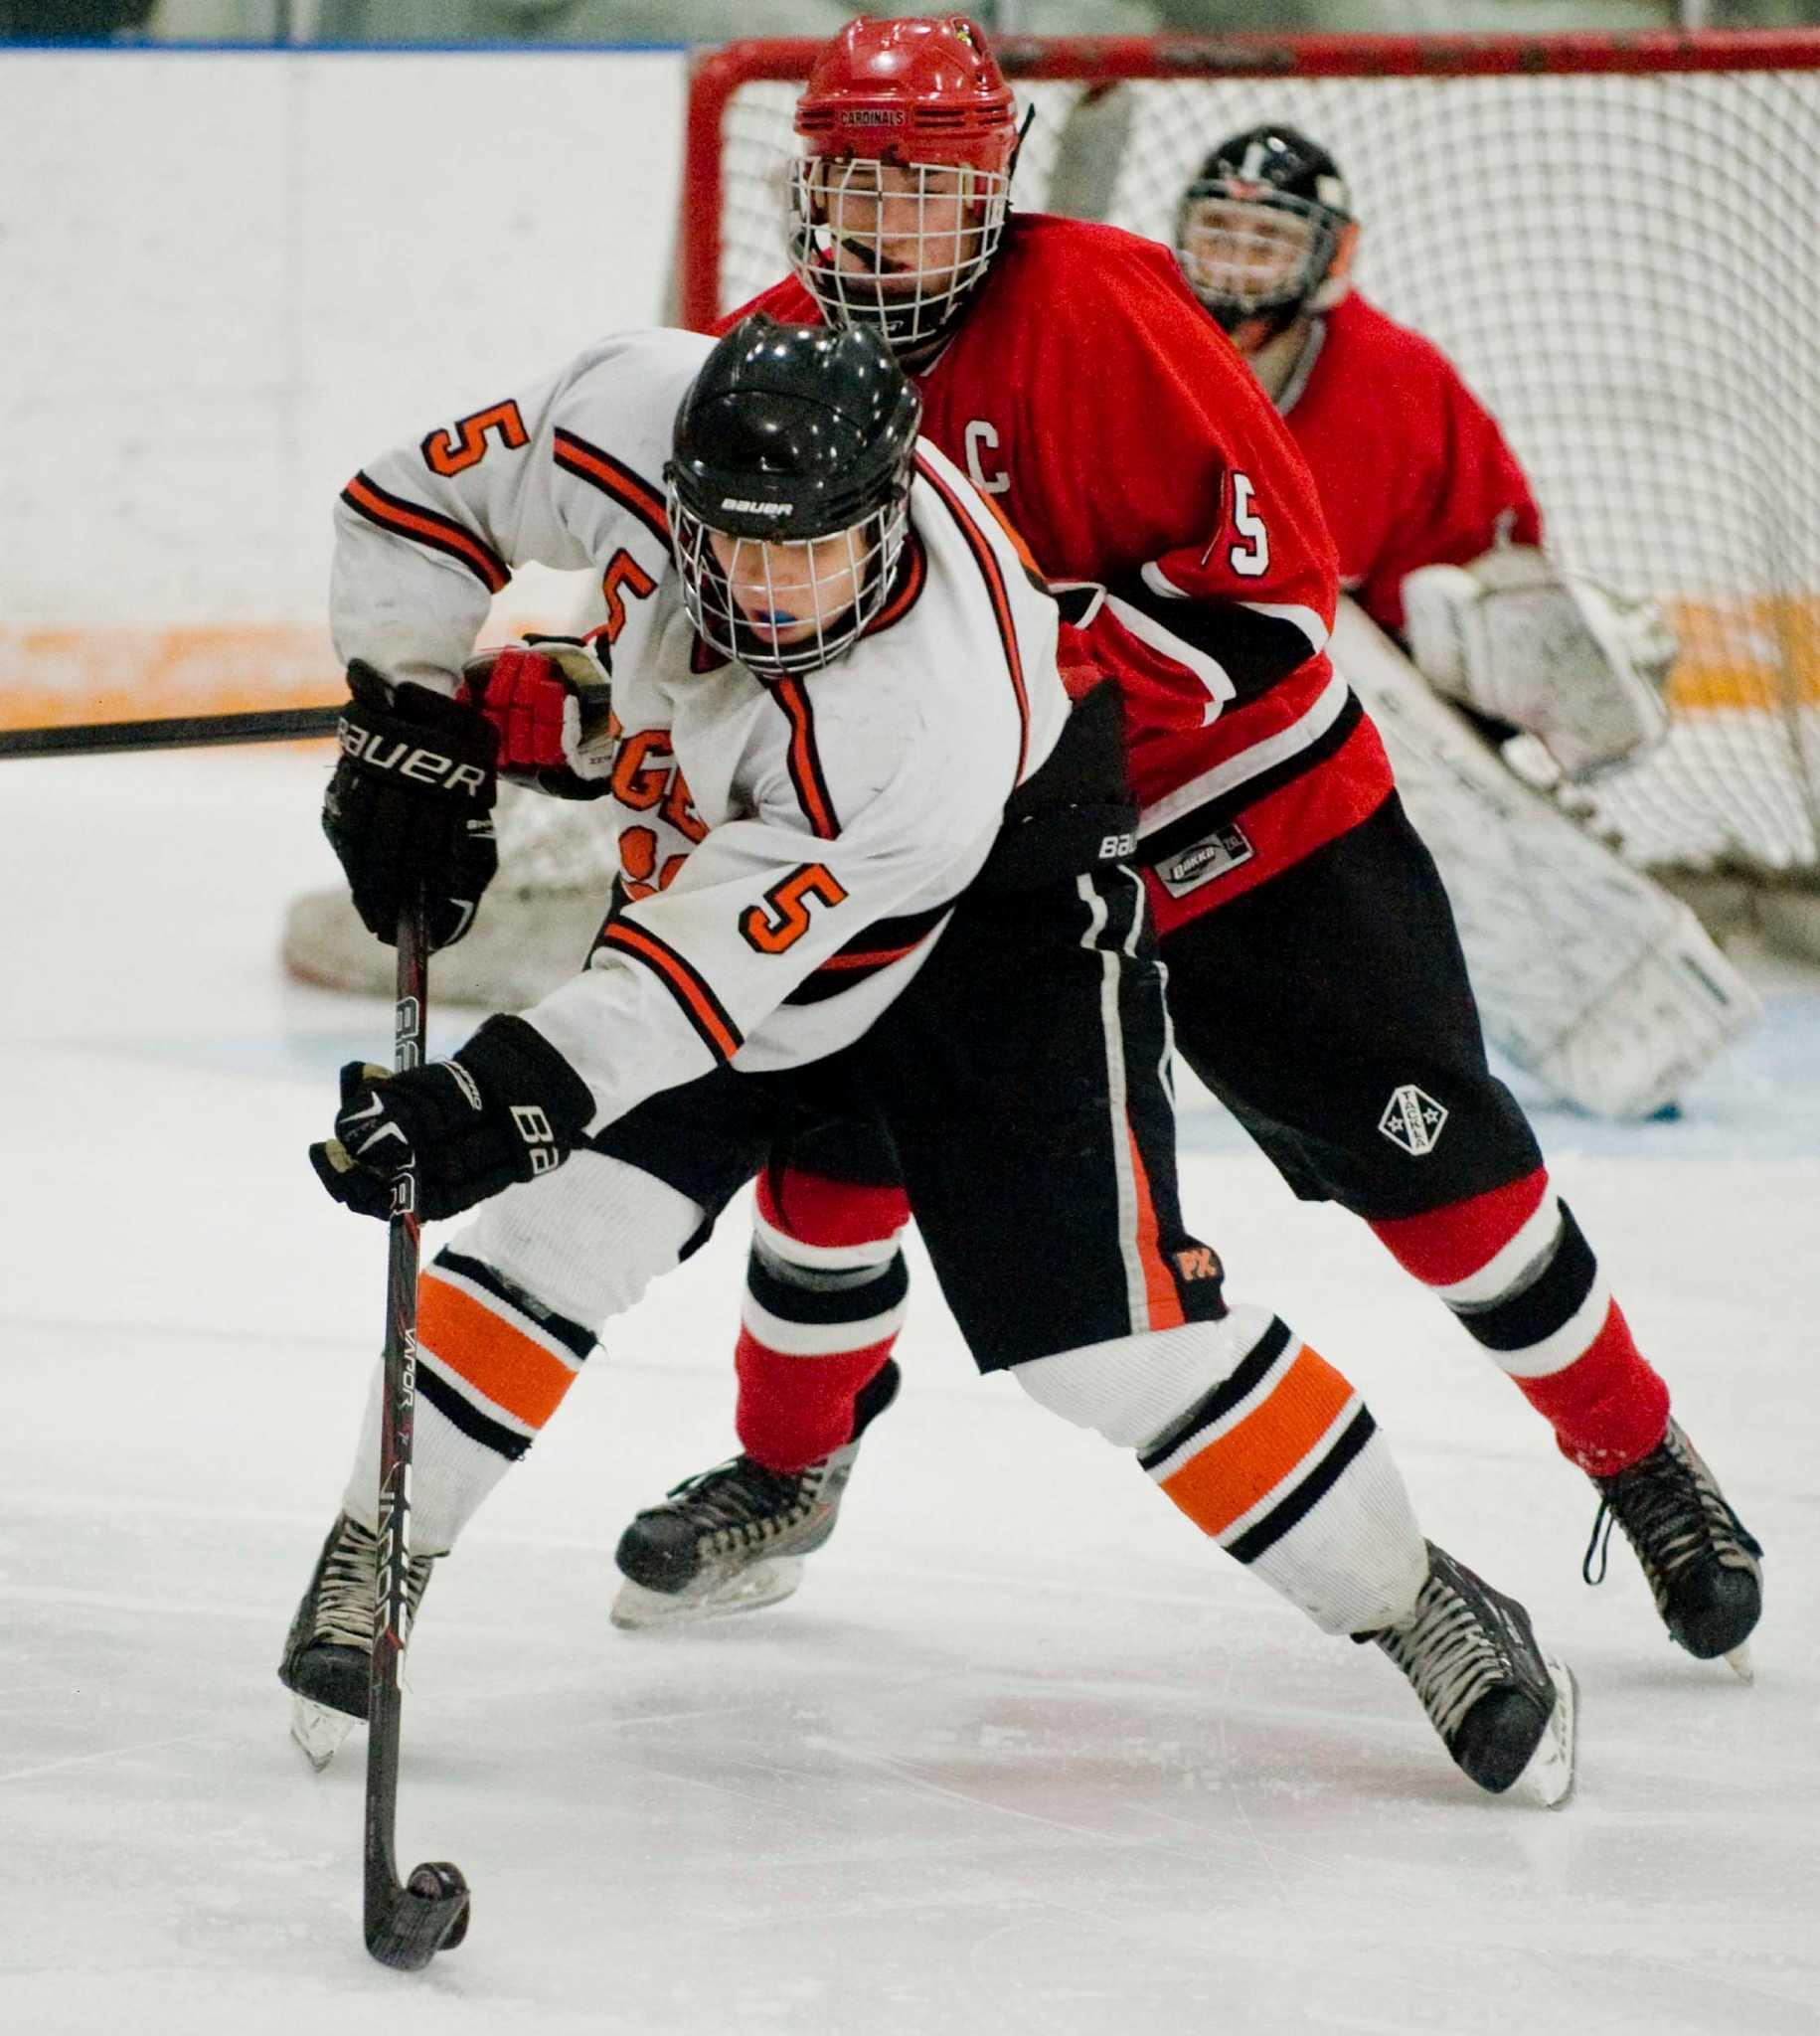 ridgefield boys hockey dominates greenwich in div i tournament